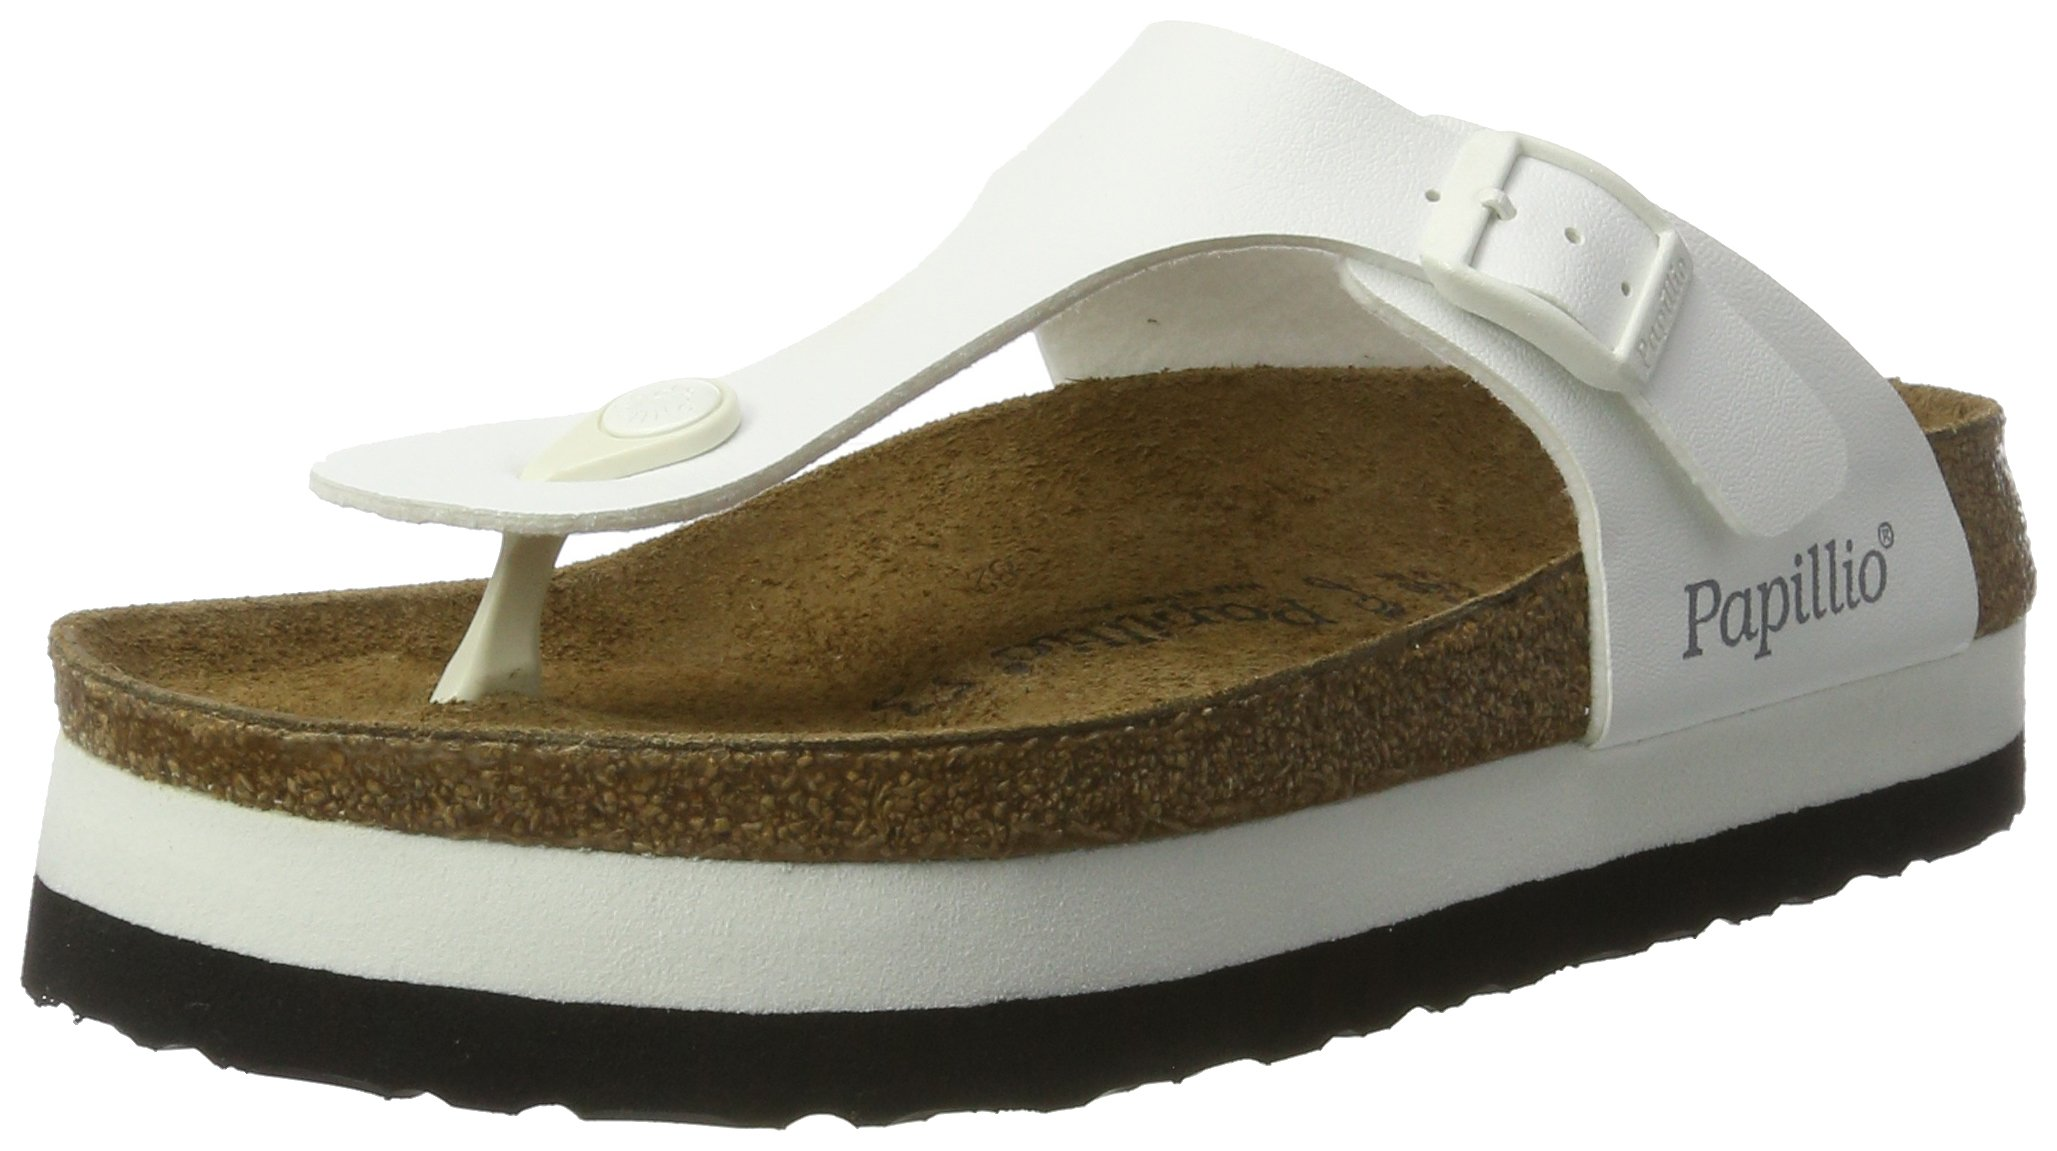 Papillio by Birkenstock Gizeh Ladies Platform Toe Post Sandals White 36